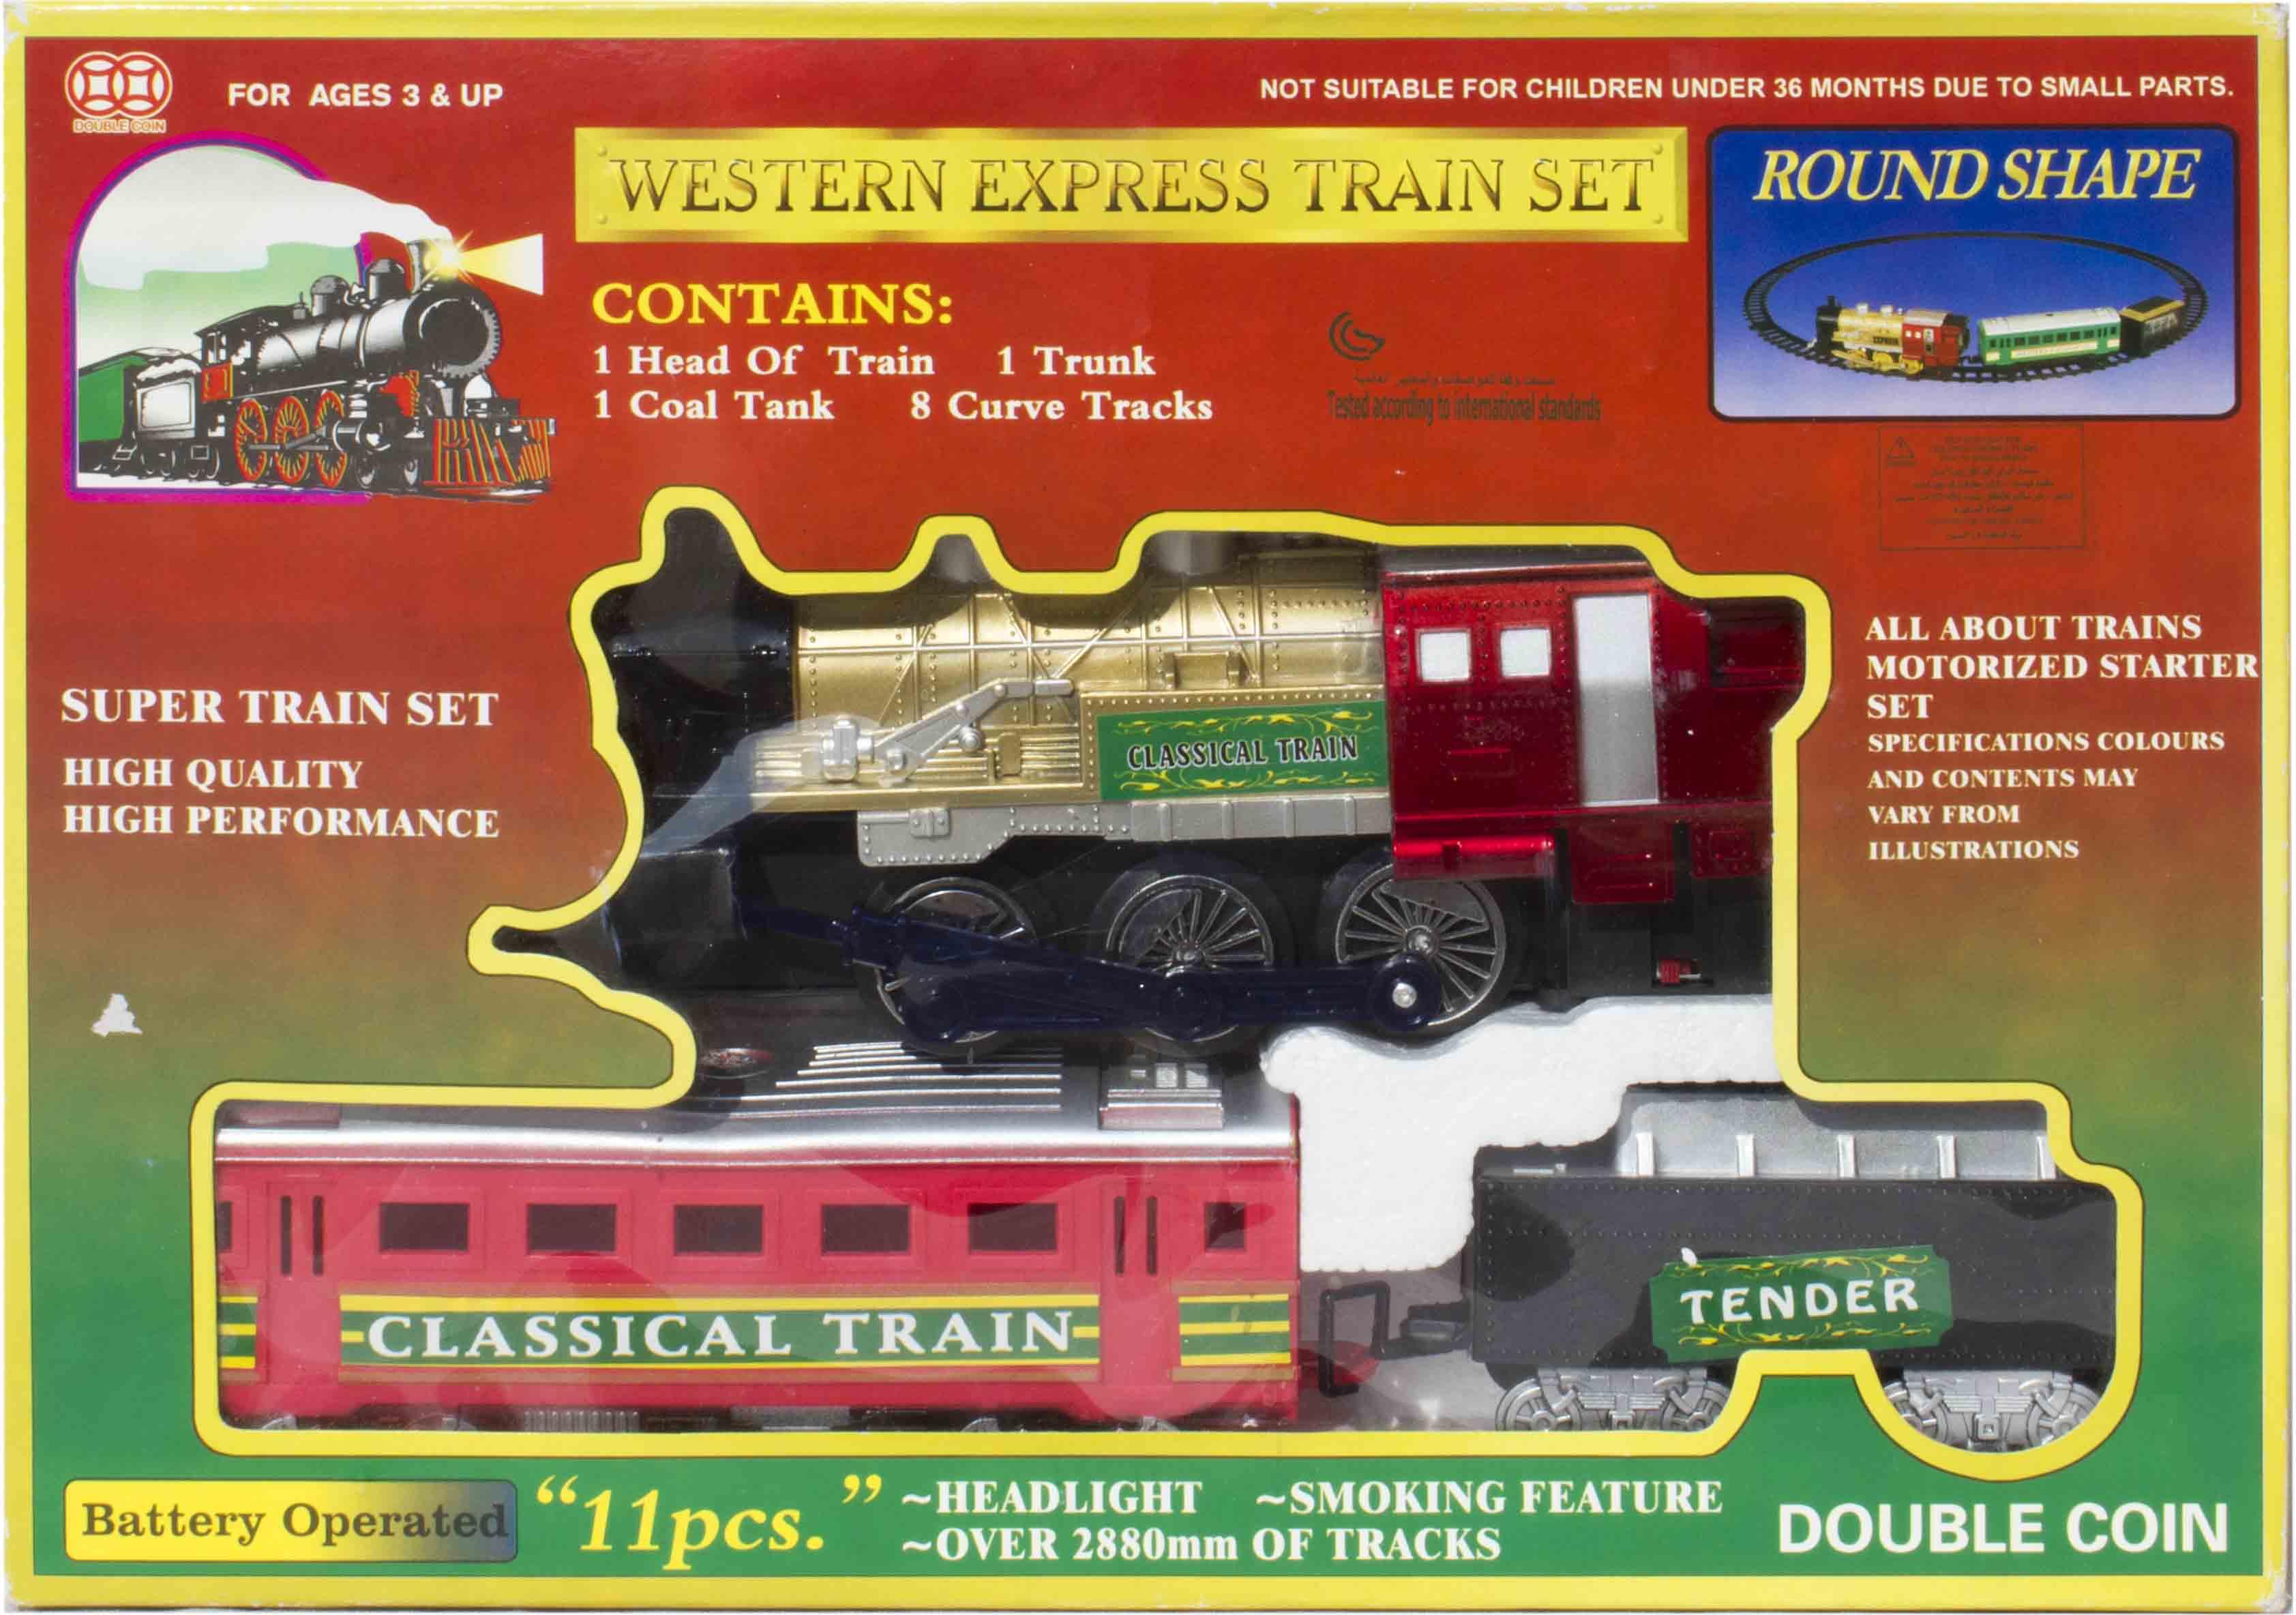 قطار ریلی باطری خور مدل واقعی